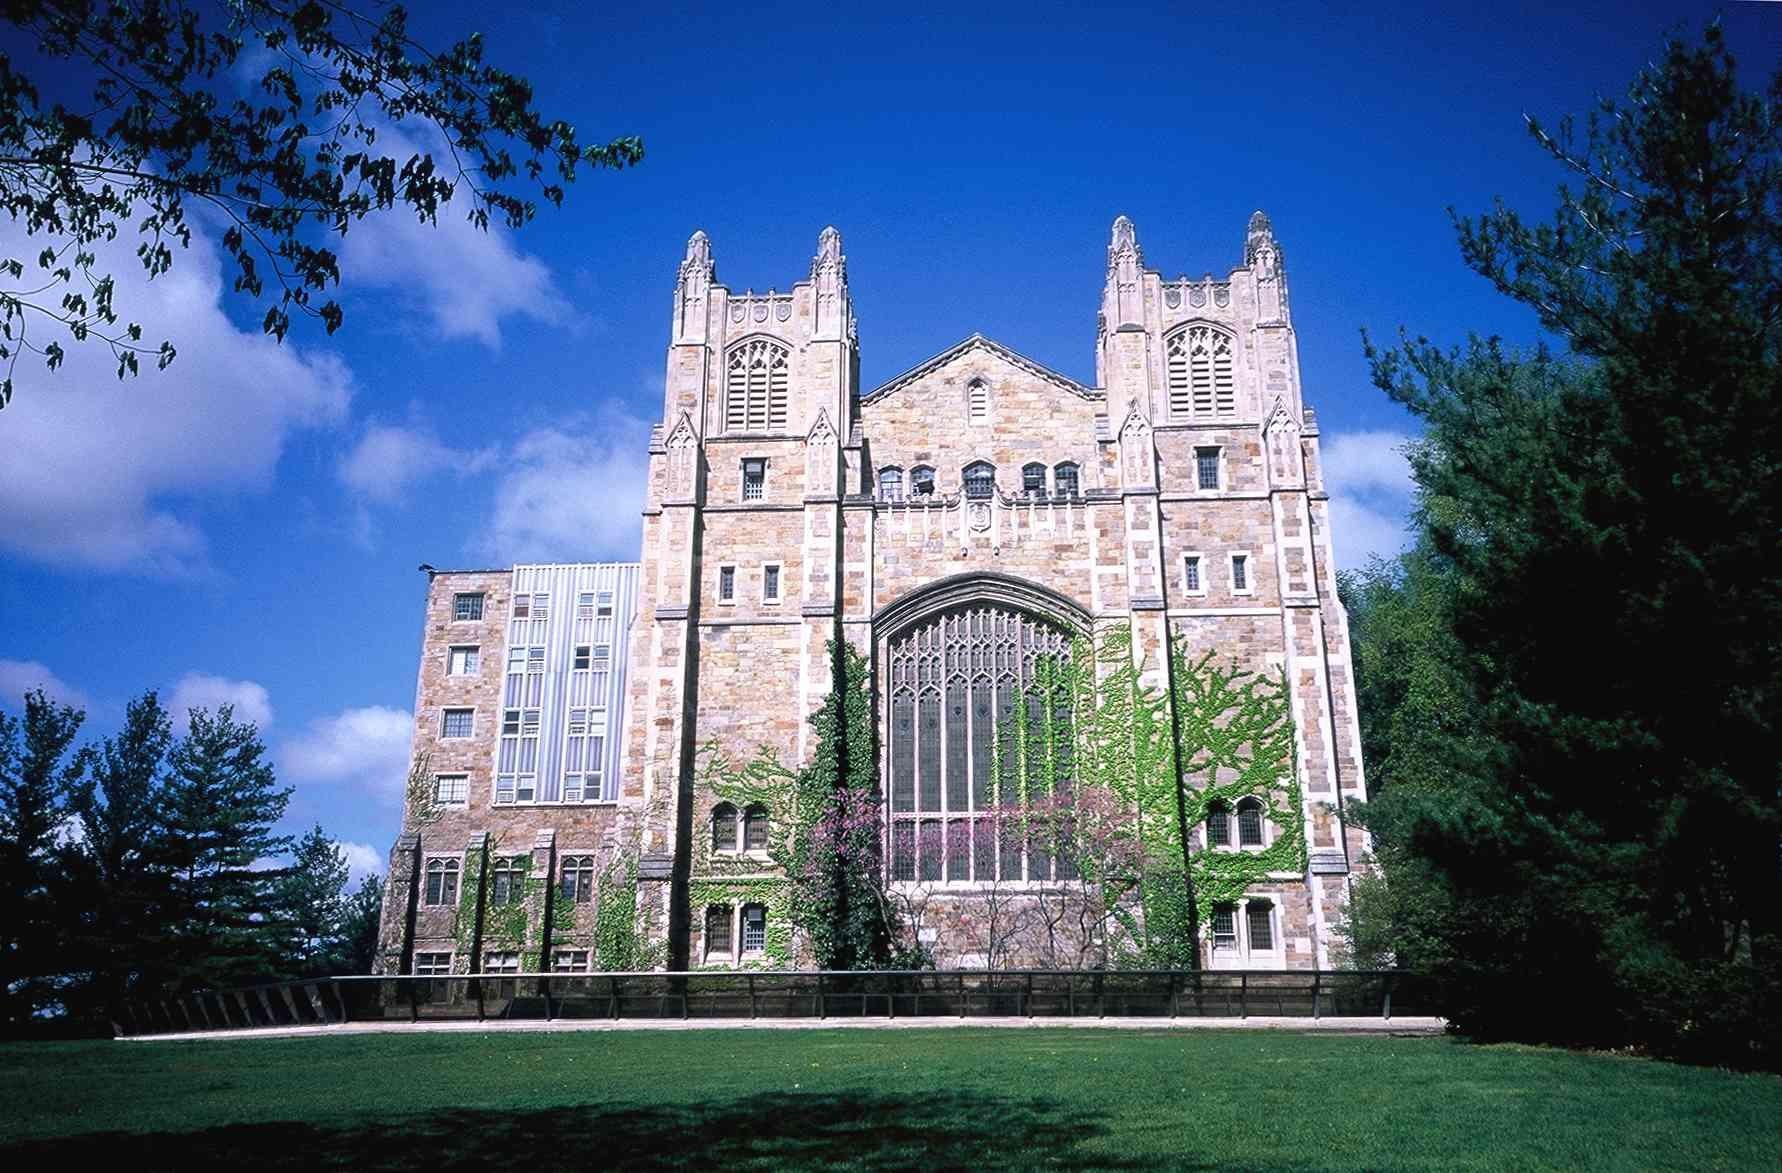 University of Michigan Law School